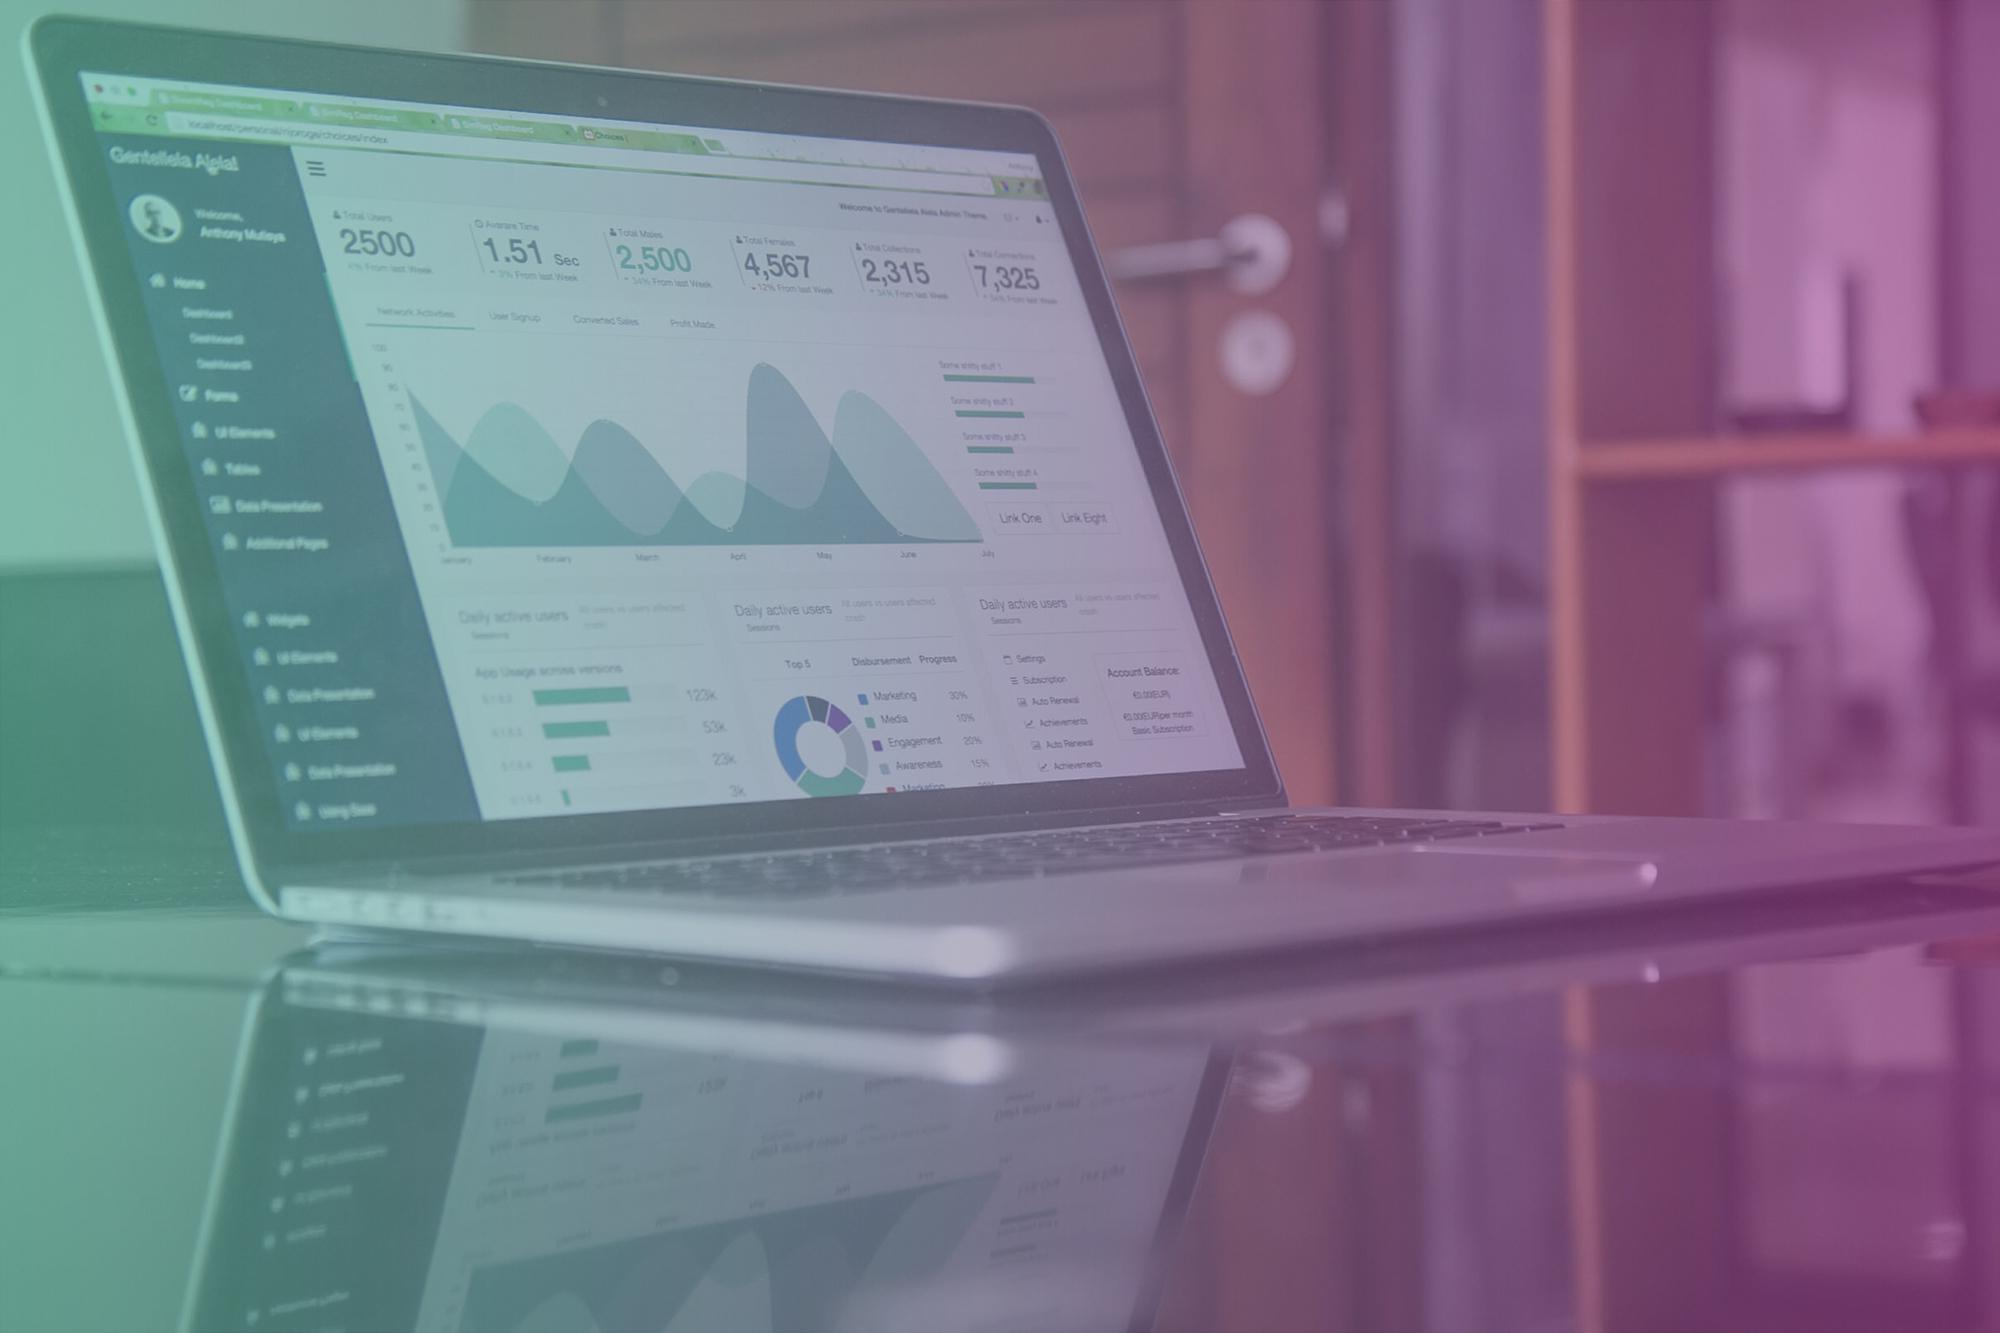 Digital Marketing Strategy Tools Guide